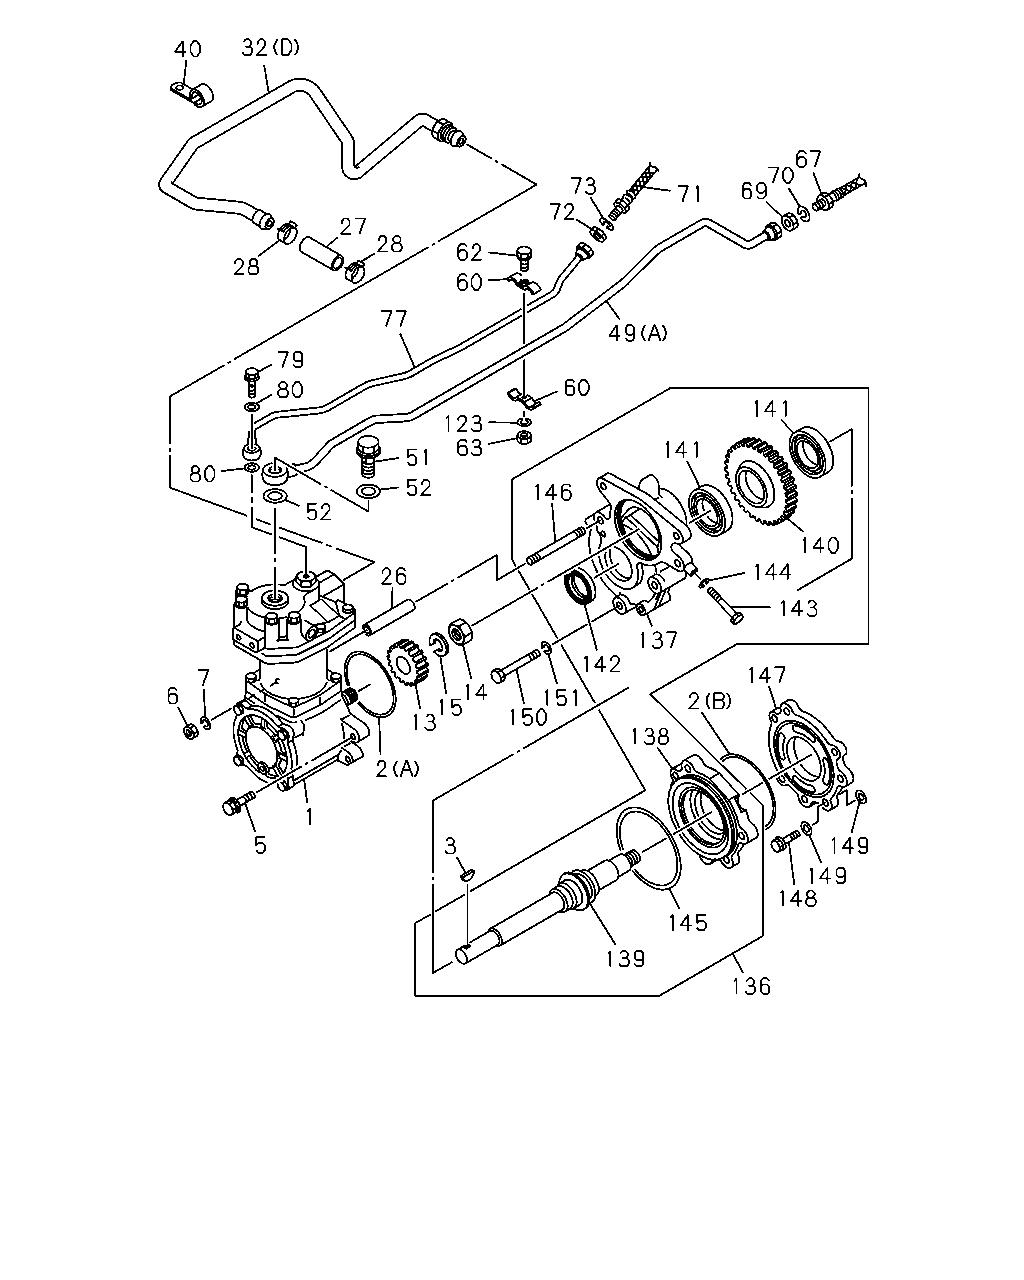 Ce 10661 Cvr 90 95 0 Engine Emission Electrical L24 Diagram B 6qa1 Std Eng